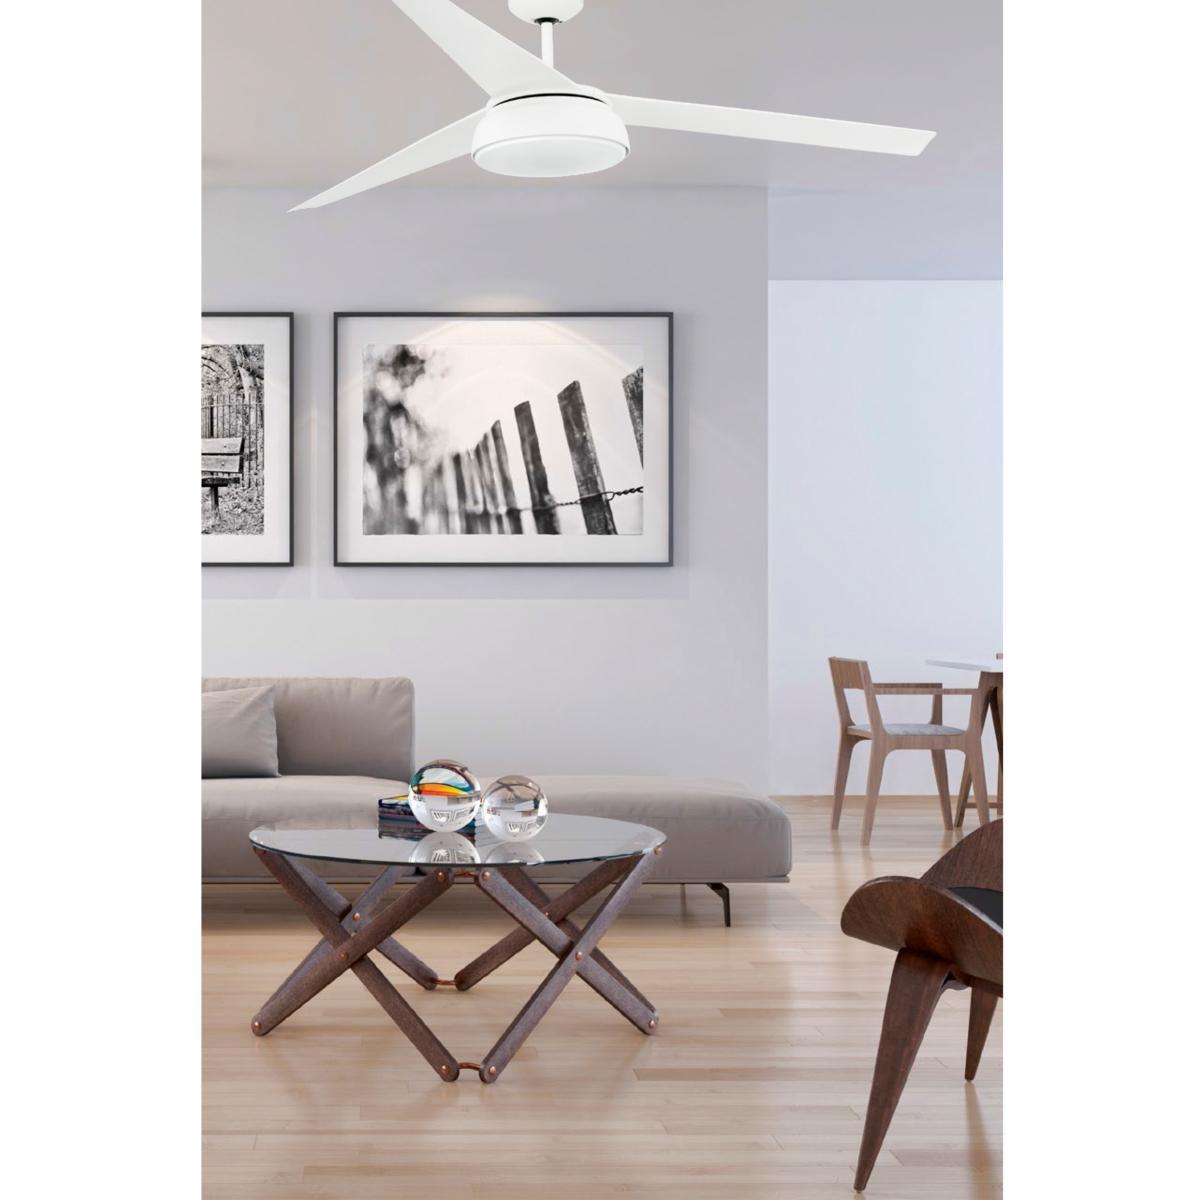 lustre ventilateur de plafond faro vulcano led dimmable 33549. Black Bedroom Furniture Sets. Home Design Ideas